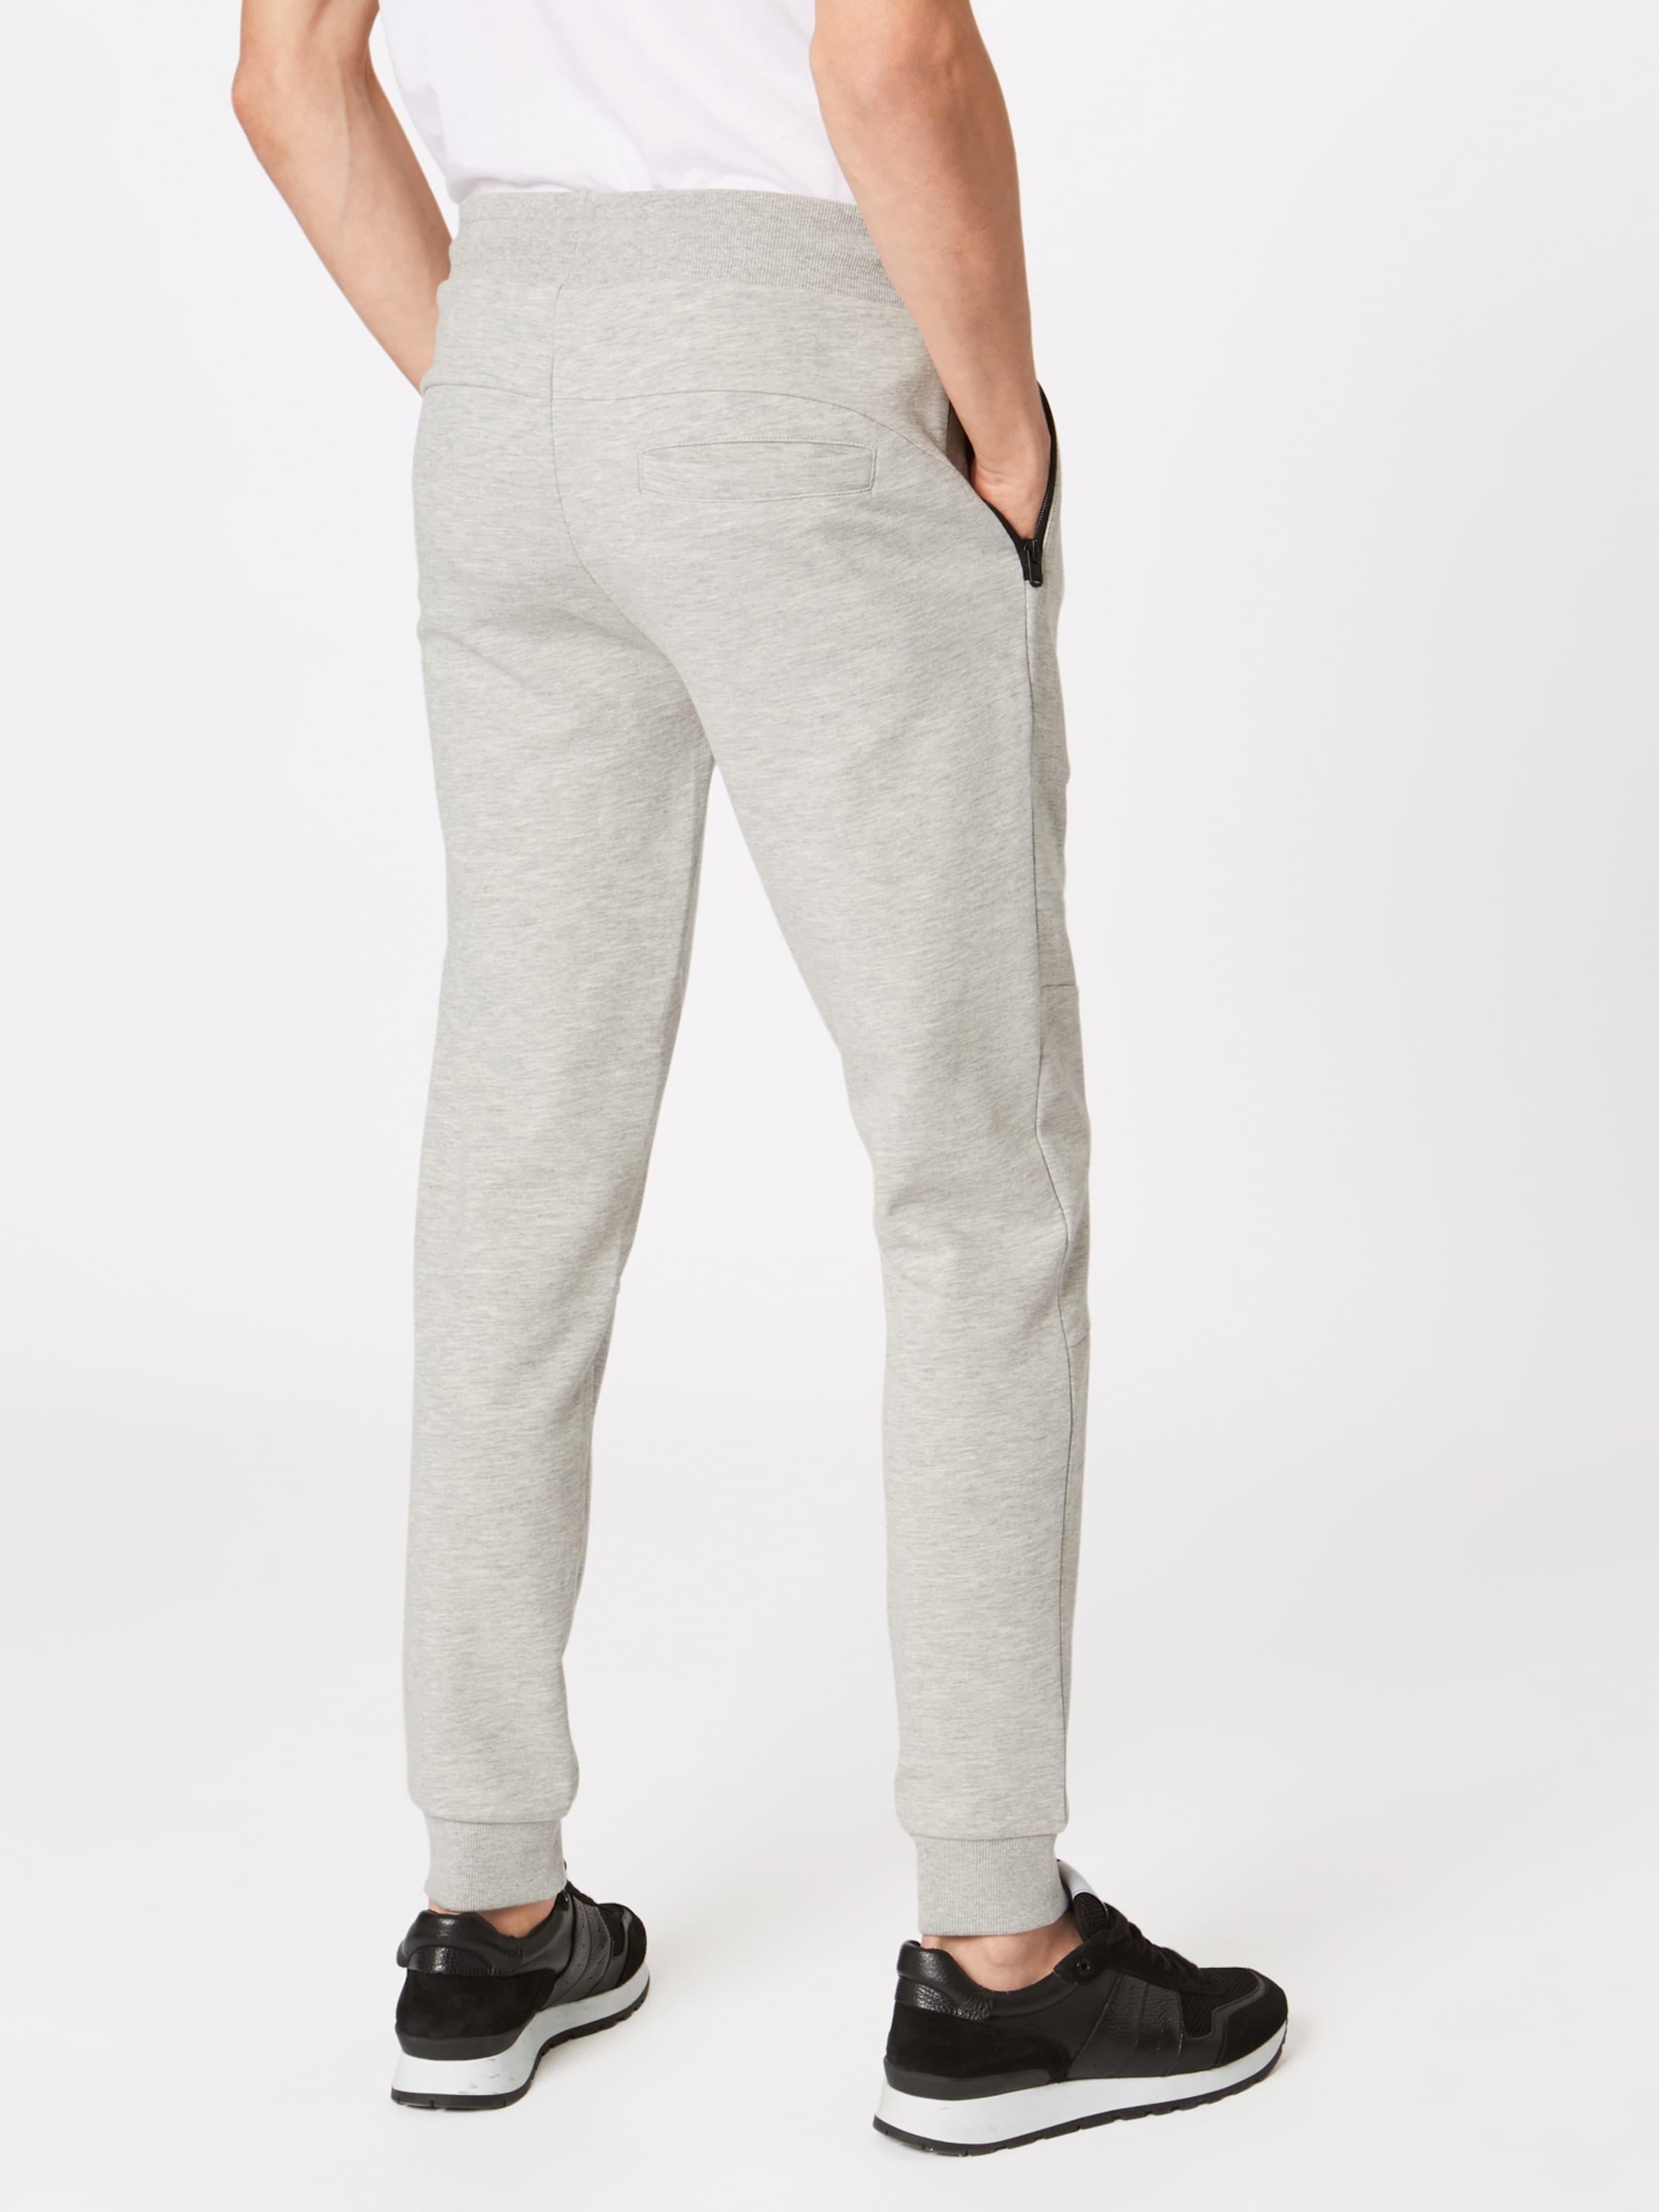 En Jackamp; Jones Pantalon Jackamp; Pantalon Jones Noir lK1cFTJ